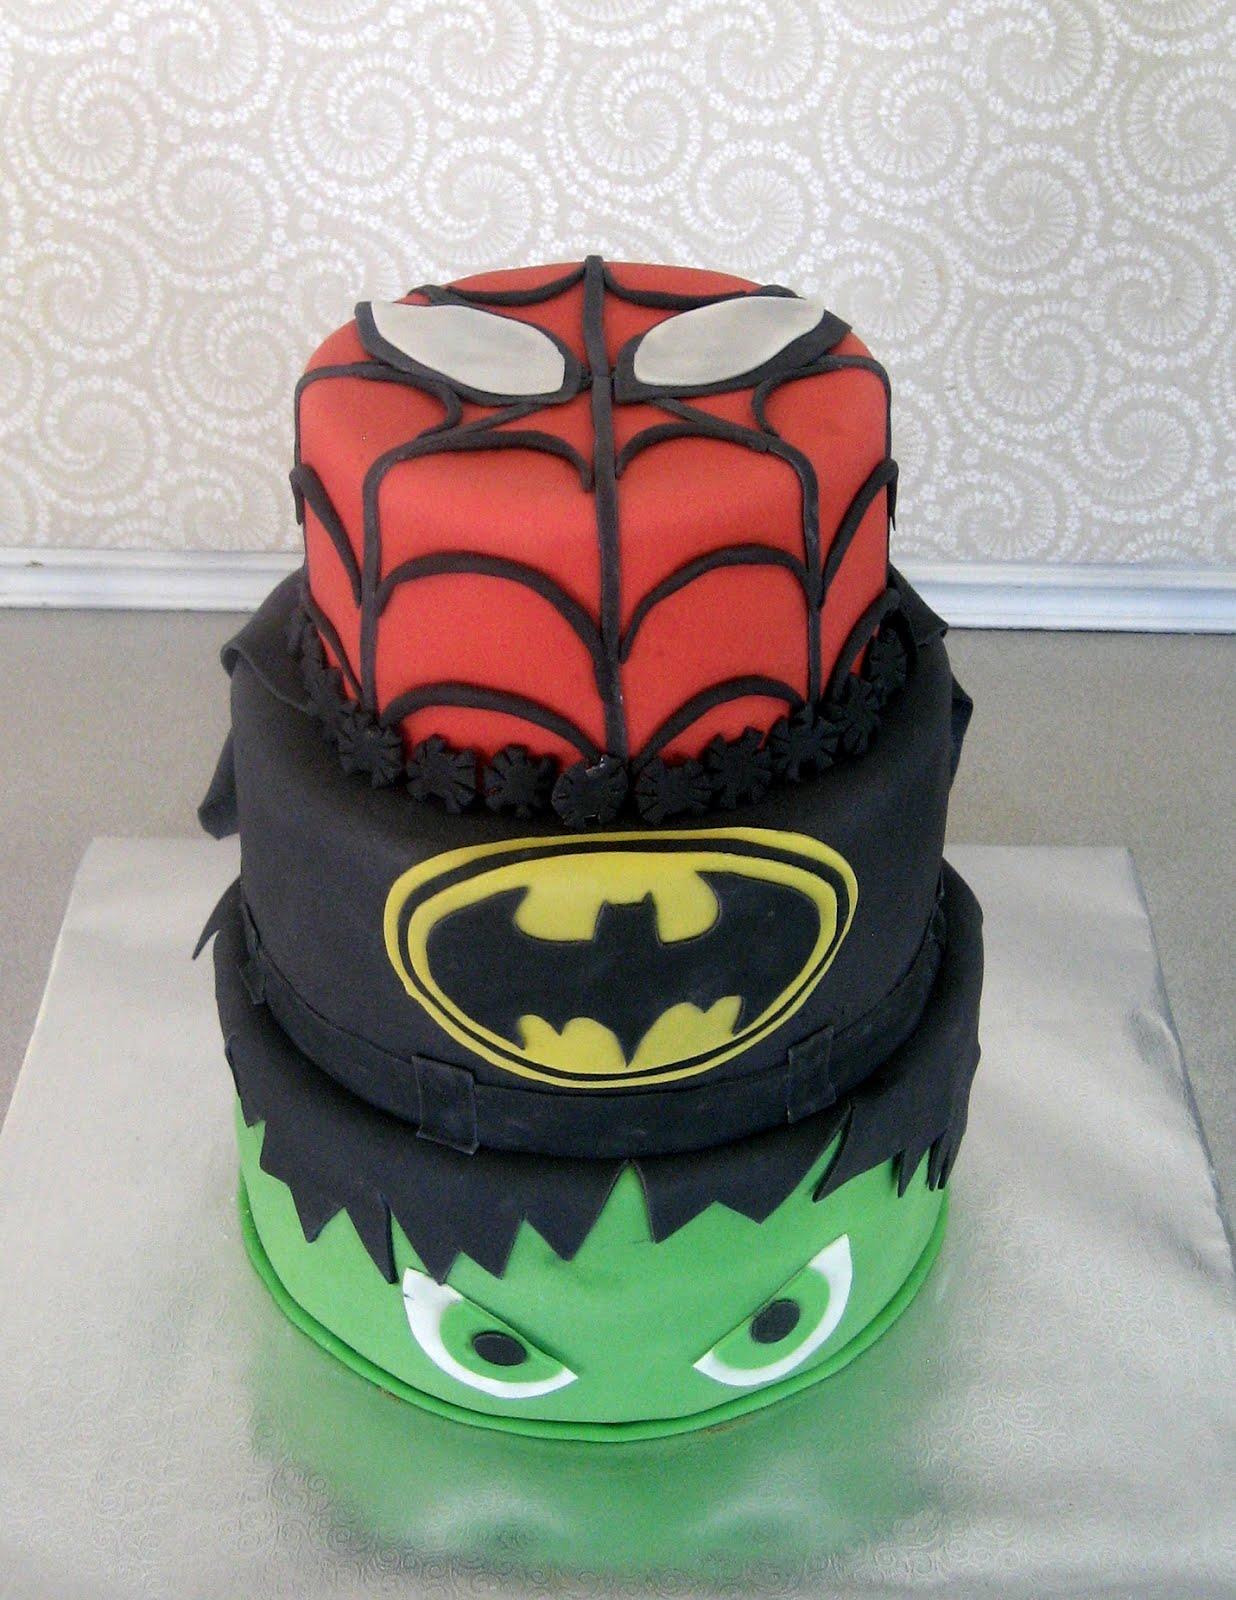 Devanys Designs Spiderman Batman and Hulk Cake